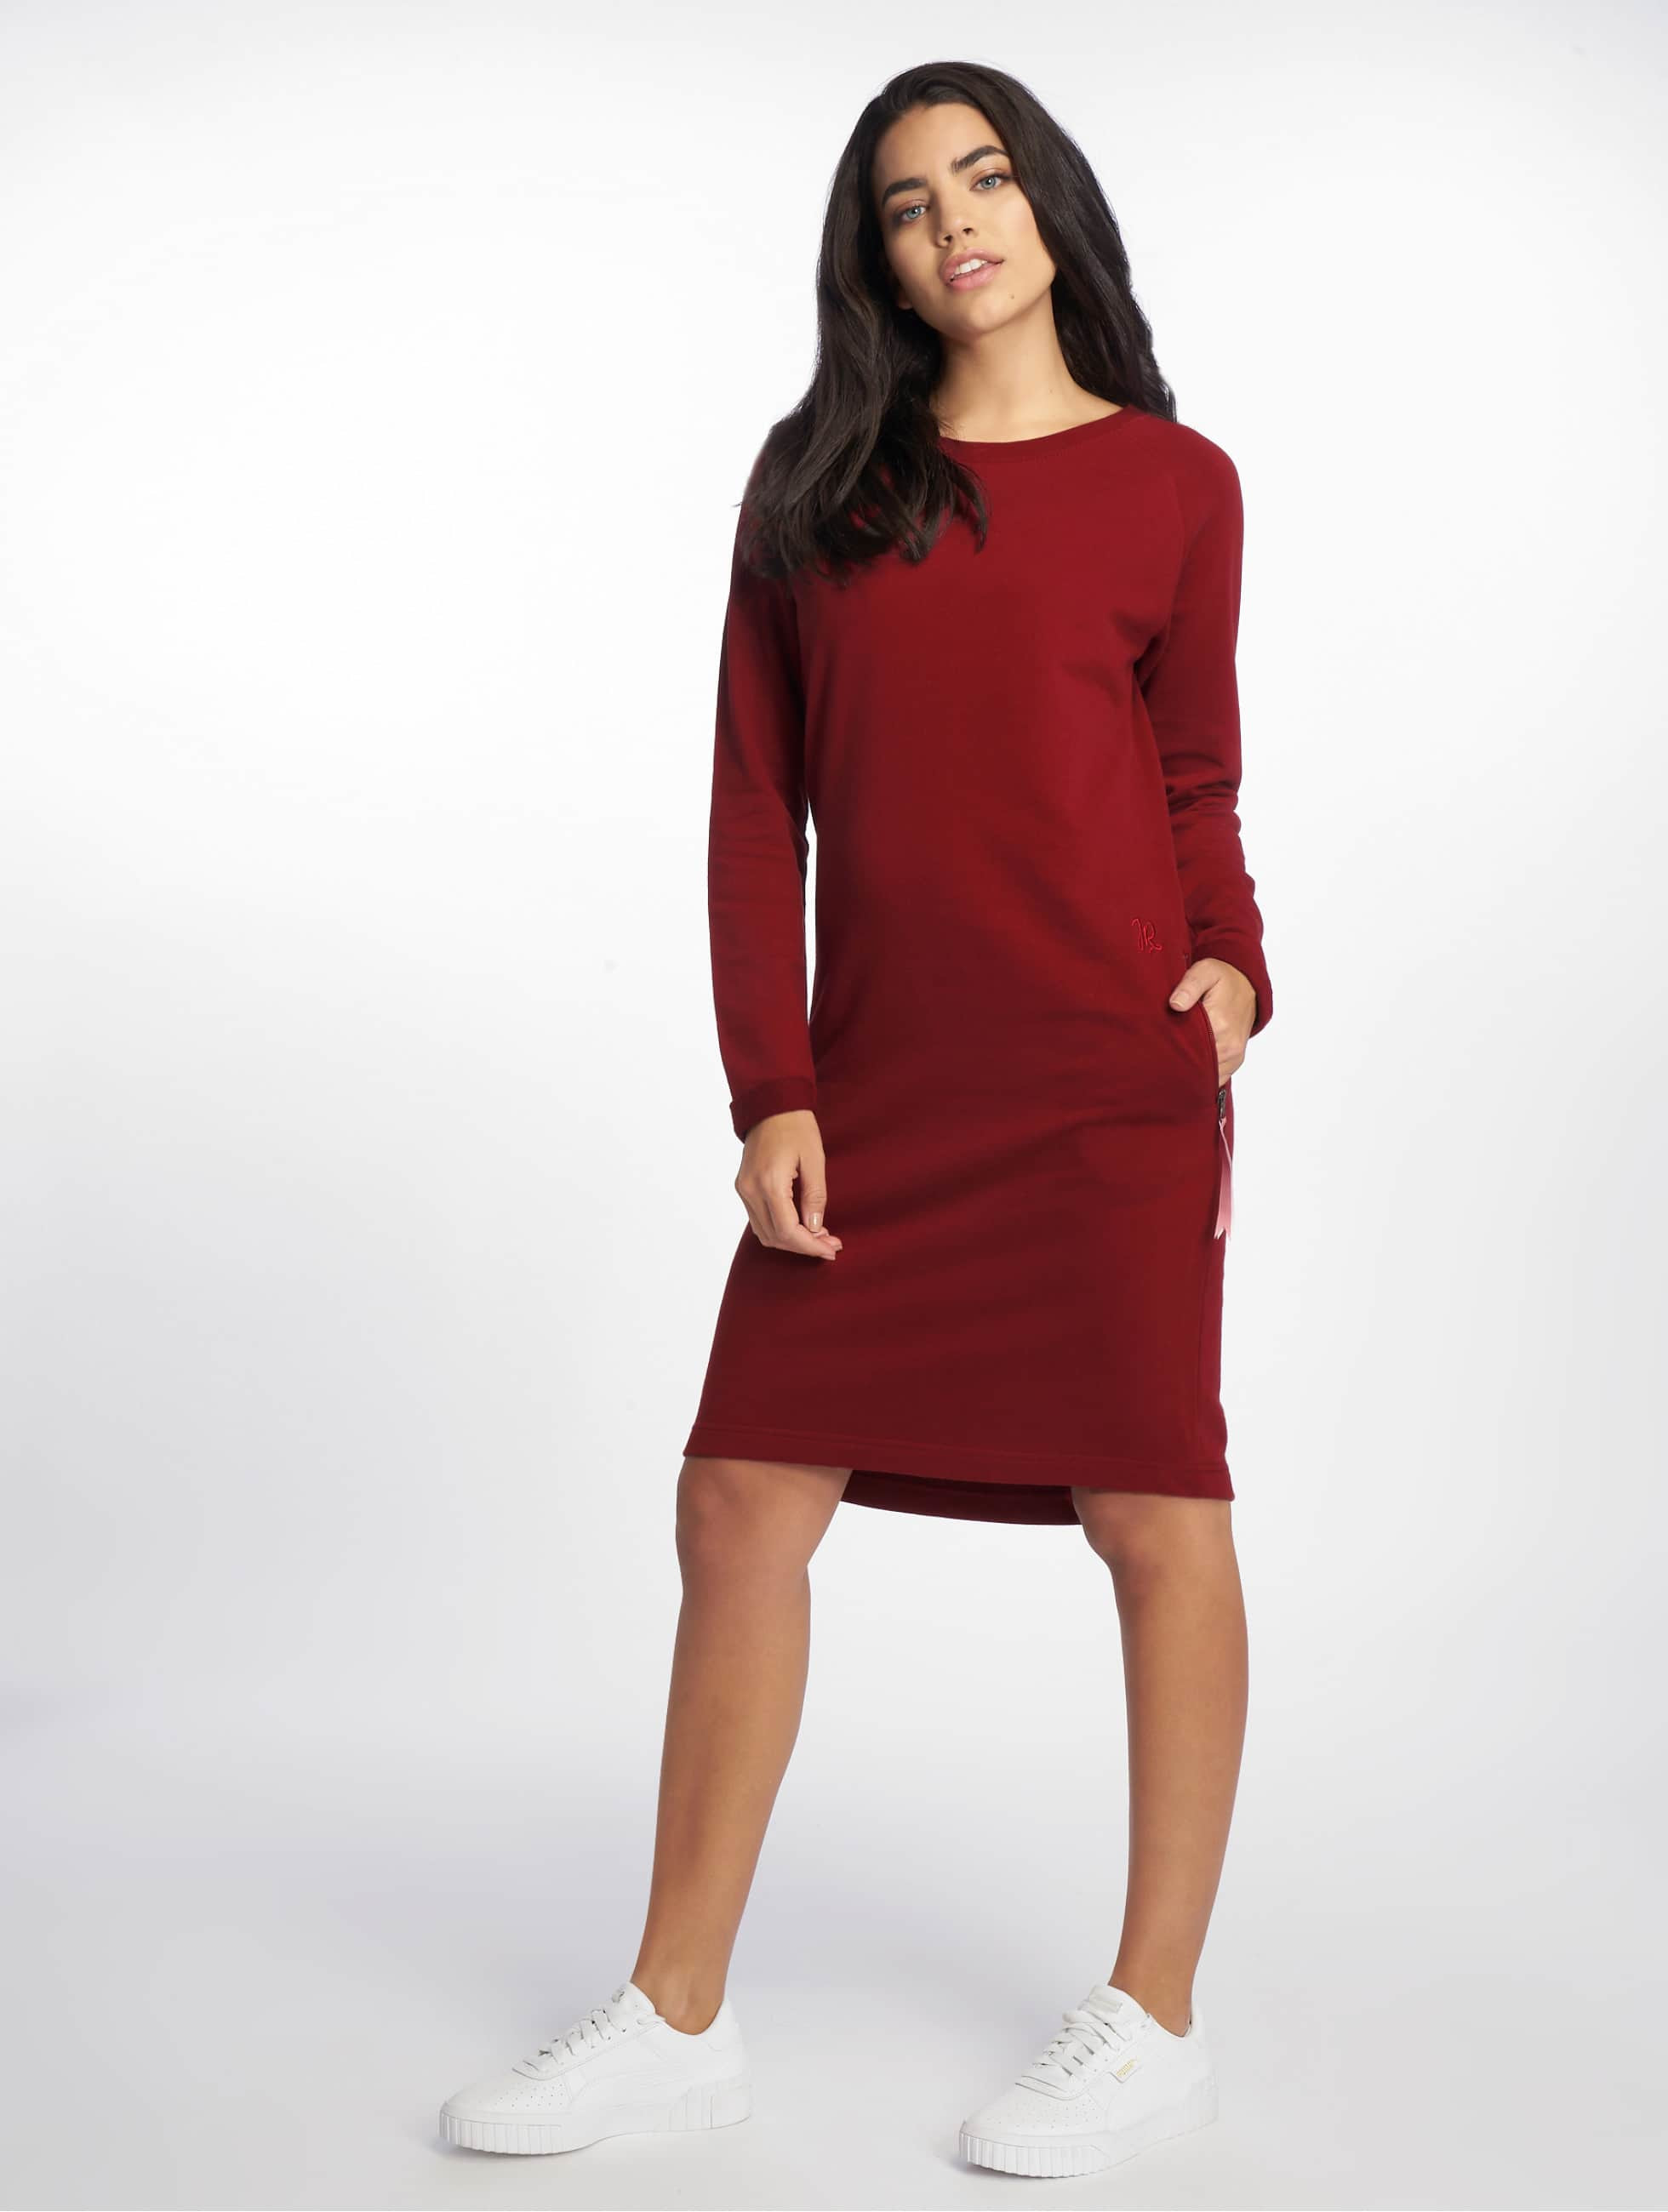 Just Rhyse / Dress Santadi in red XL